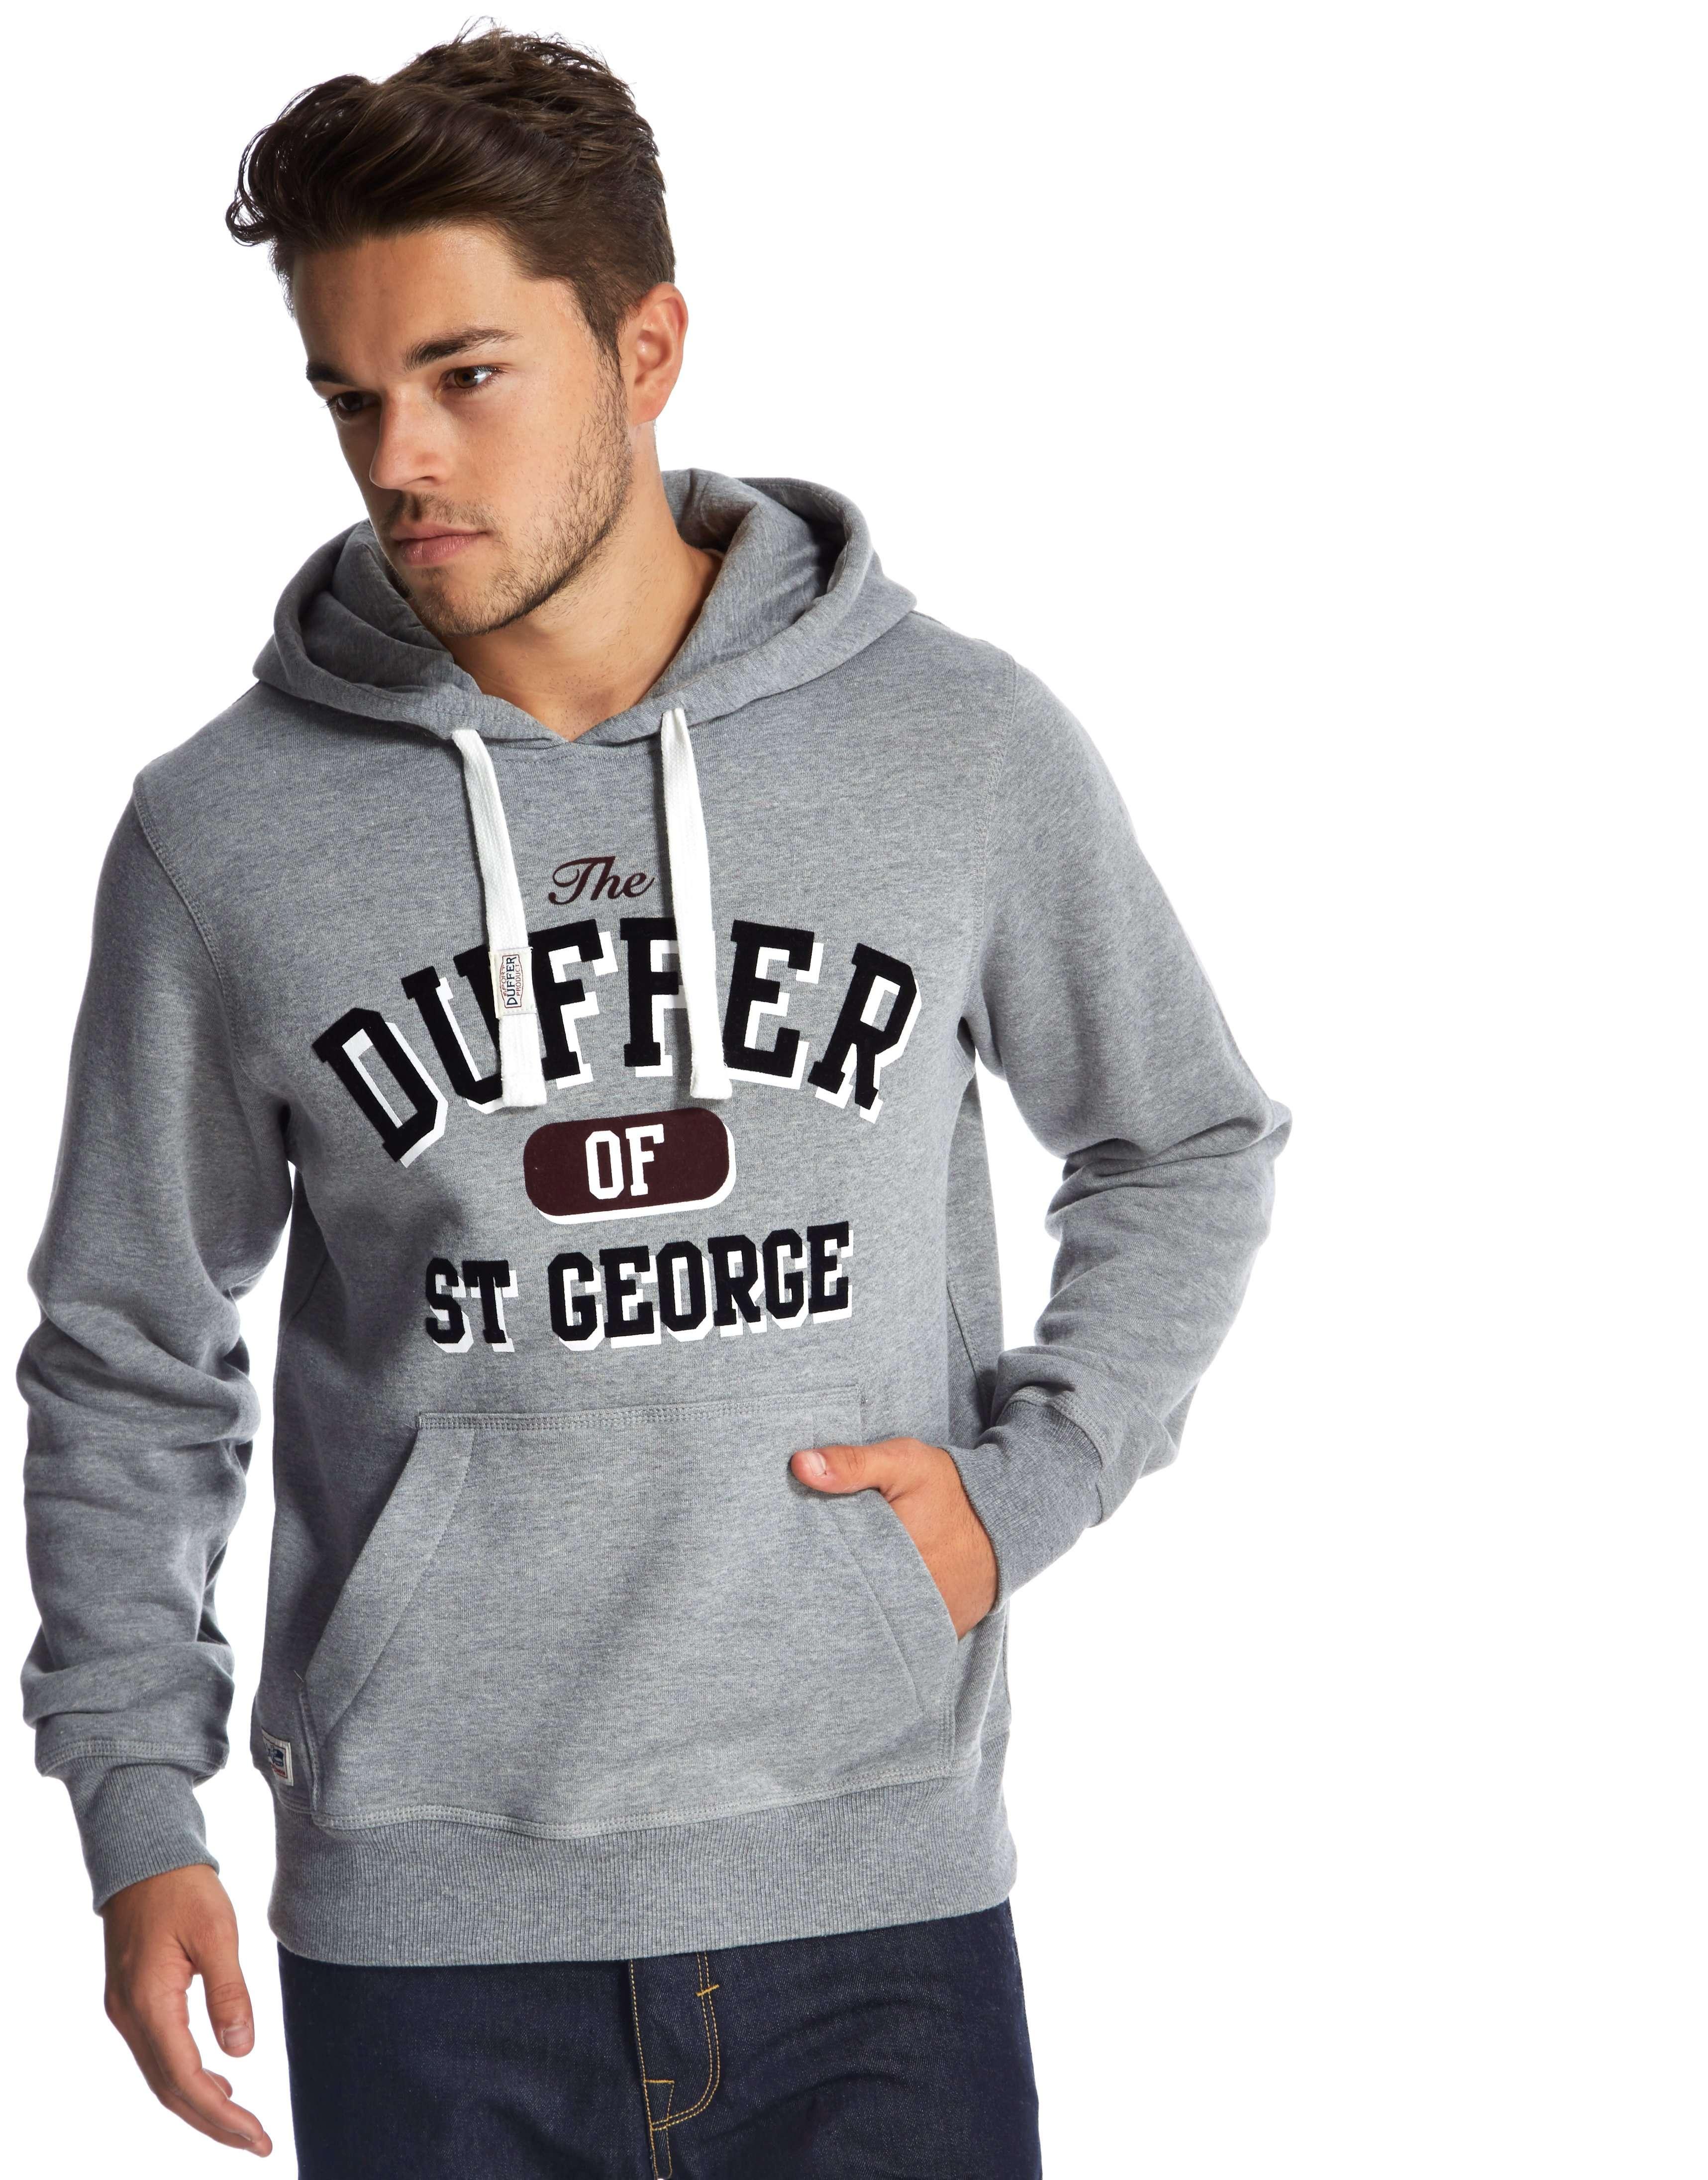 Duffer of St George New Standard Hoody